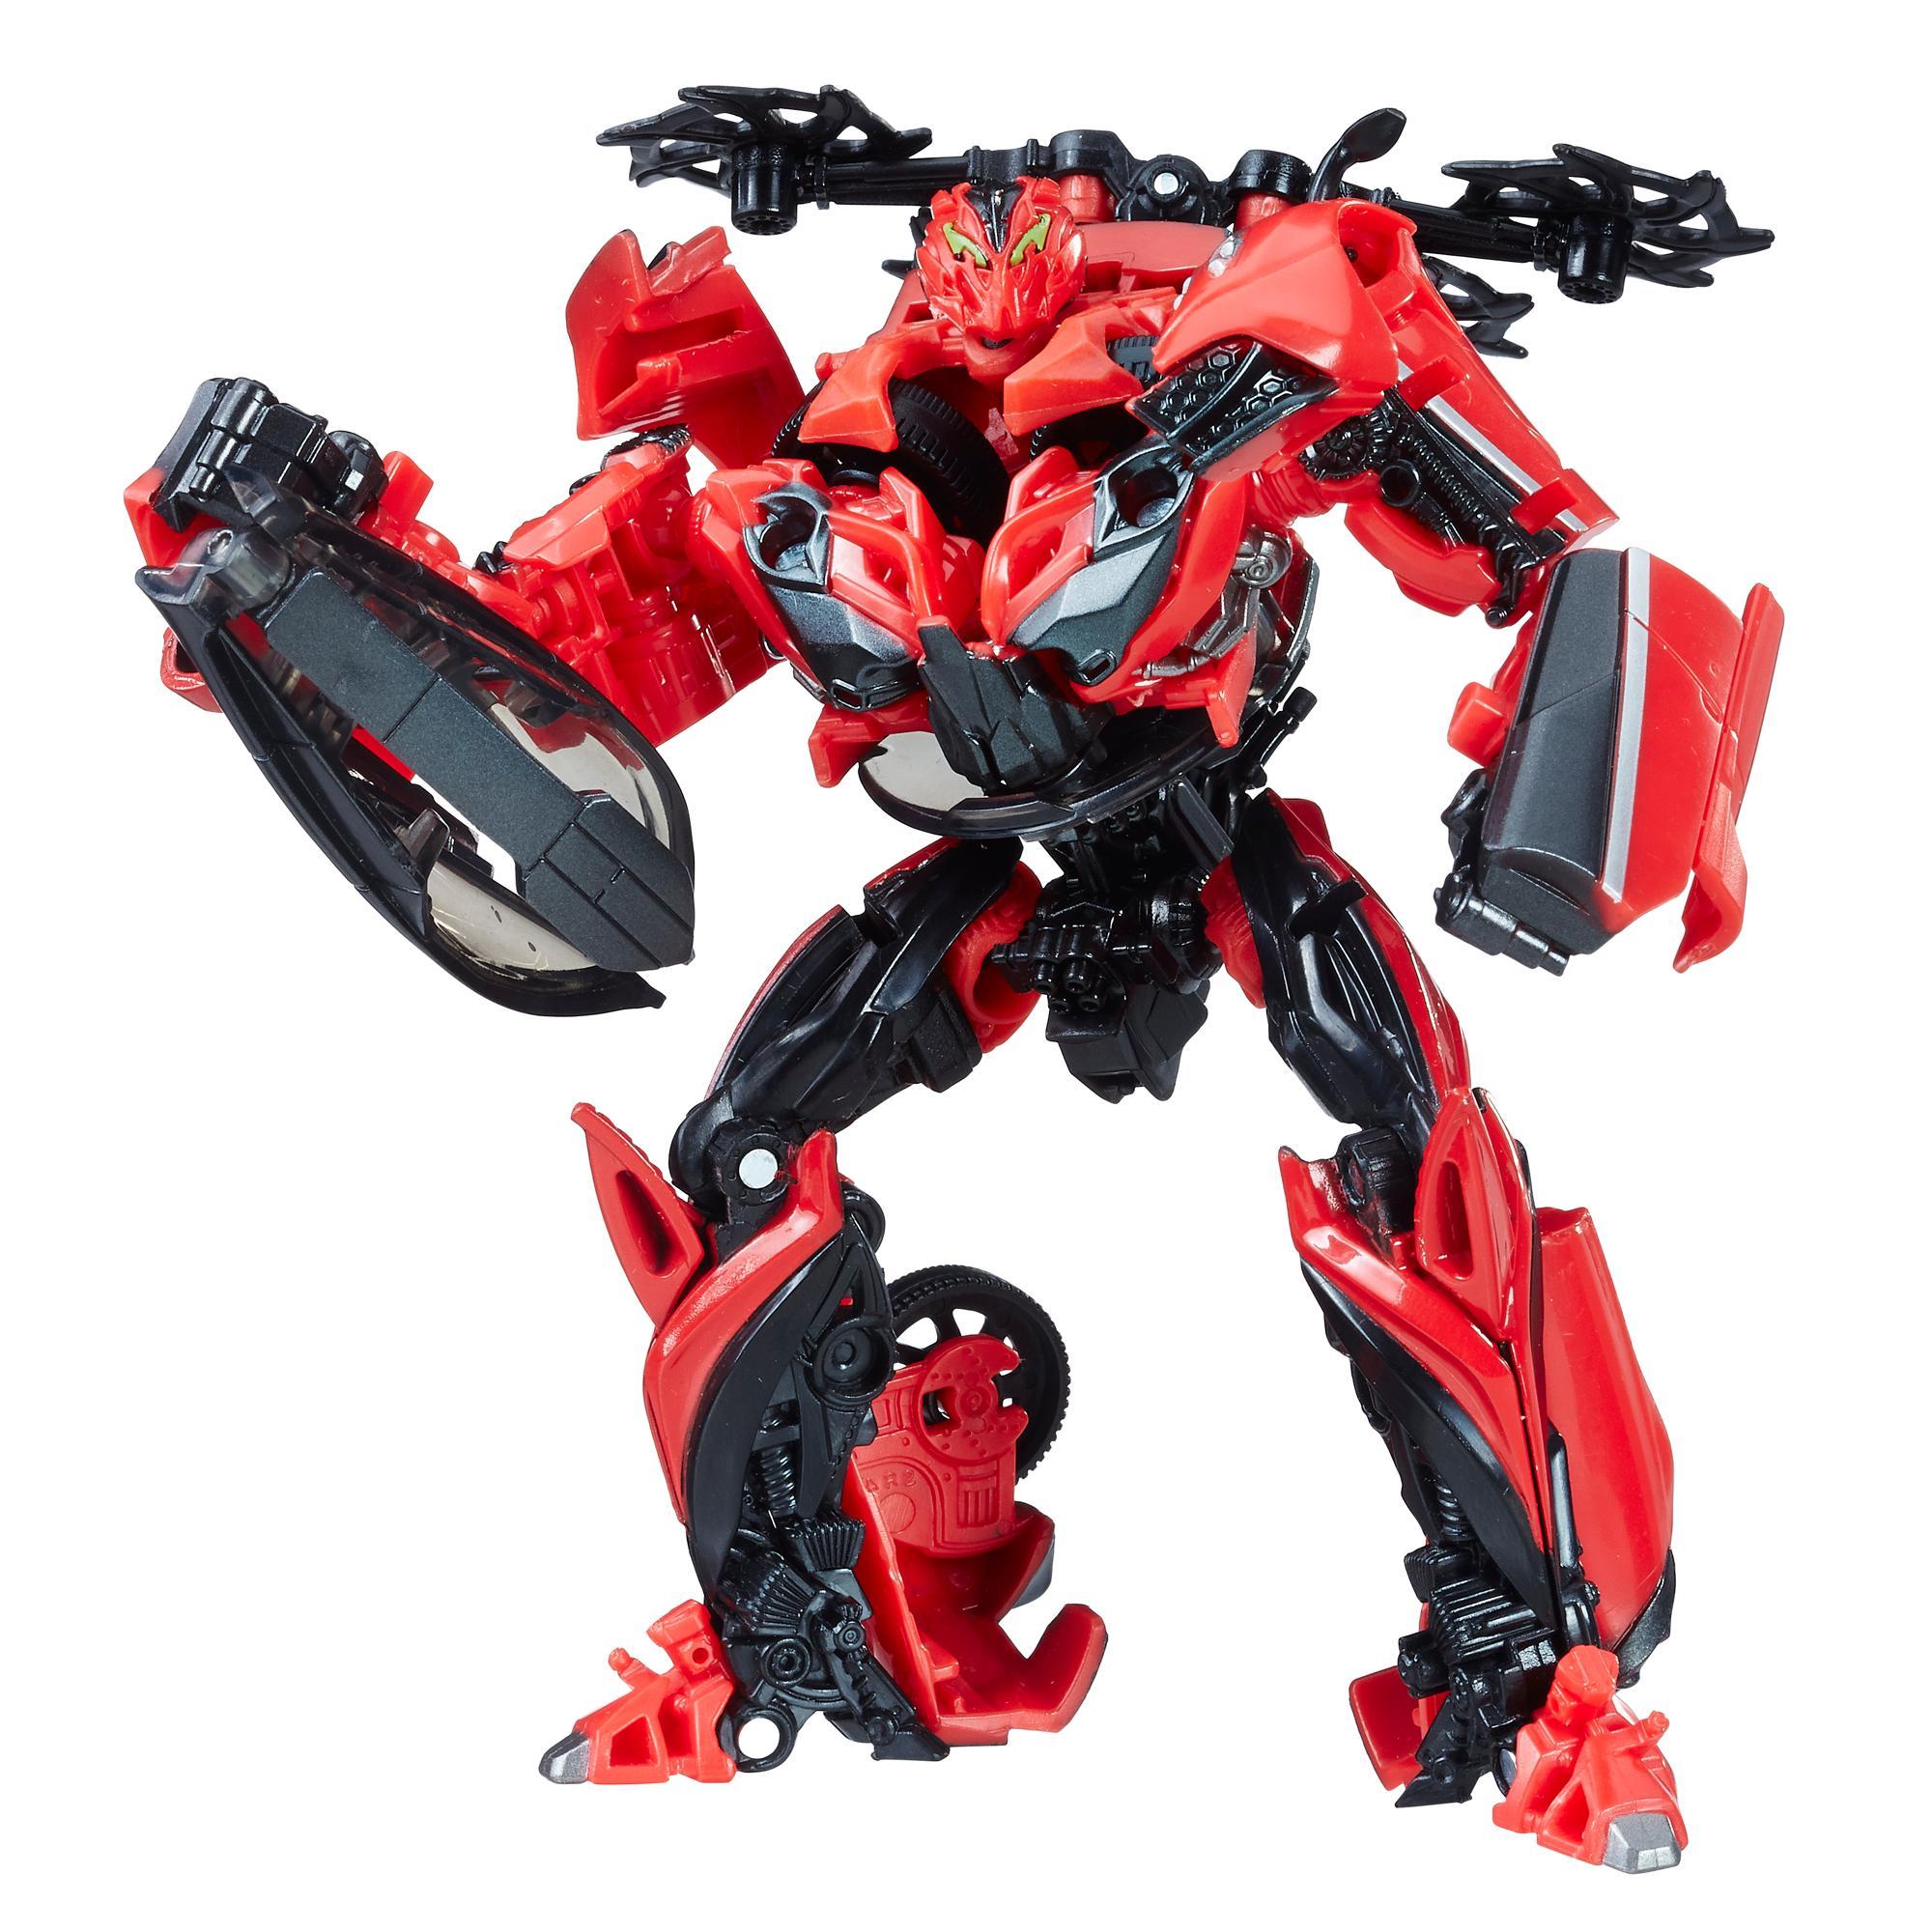 Transformers - Studio Series 02 (Film 4) - Decepticon Stinger de classe de luxe